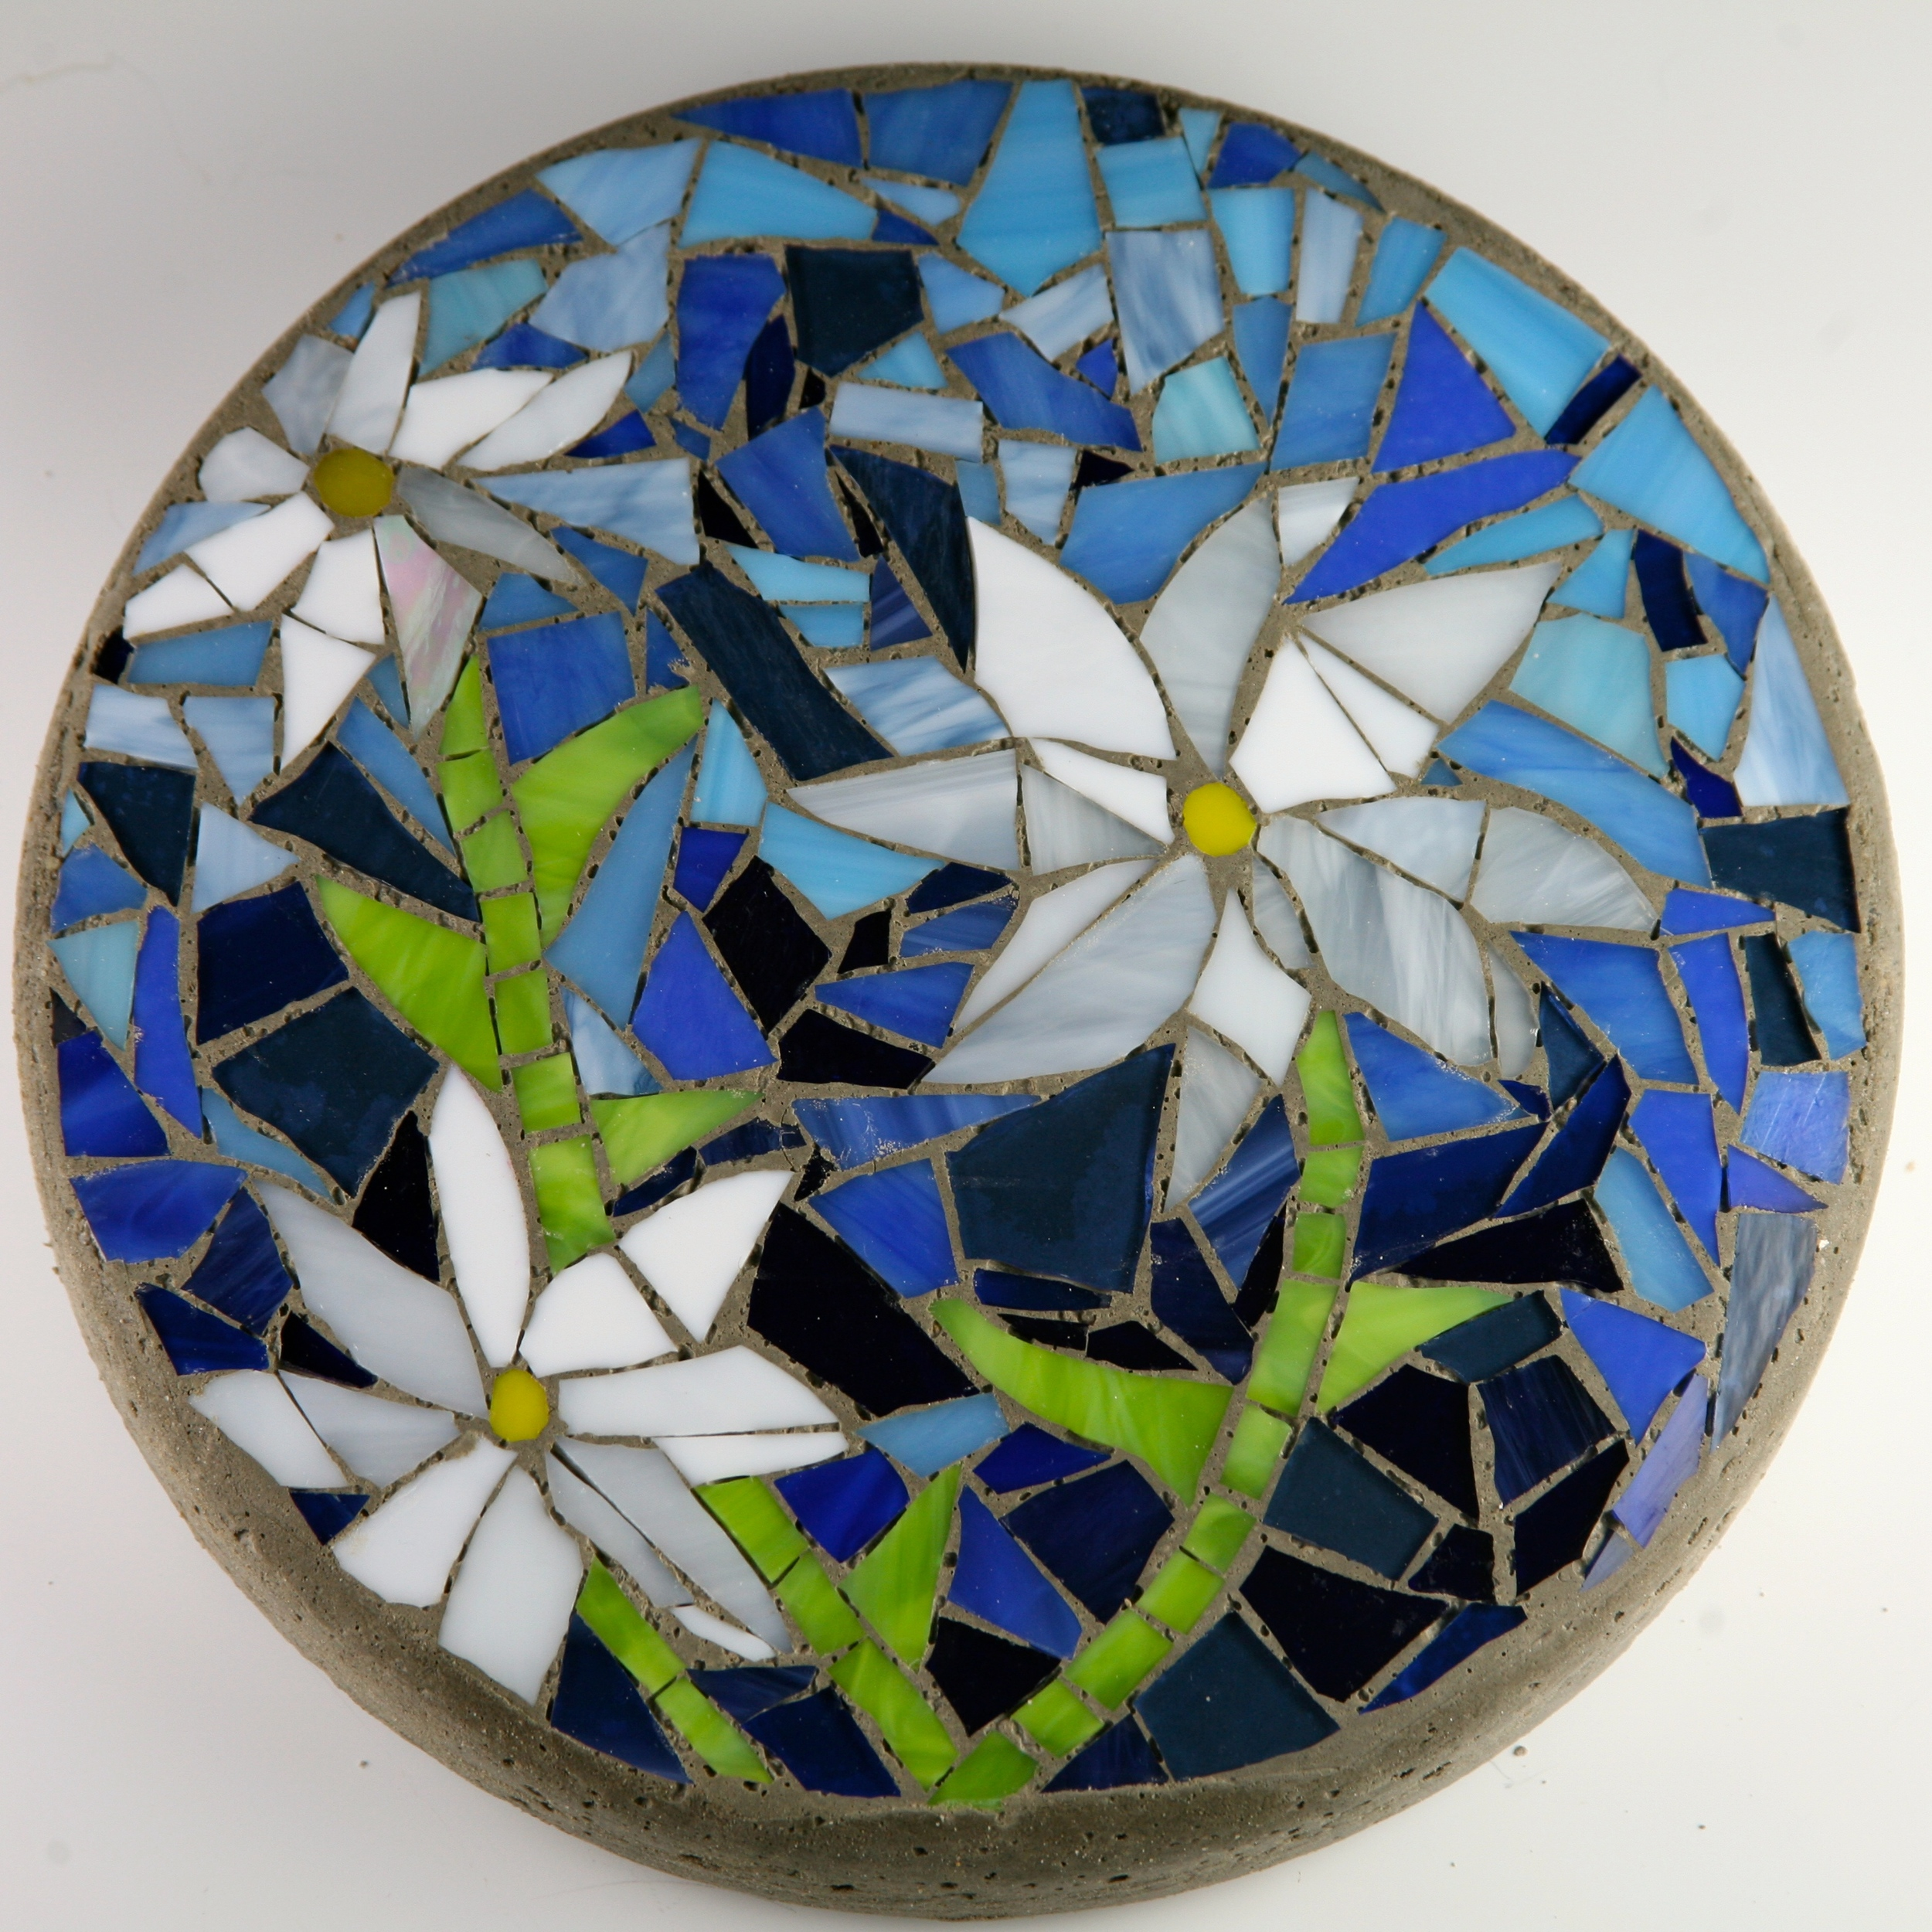 Mosaic stepping stones christine kenneally mosaic artist for Mosaic garden designs